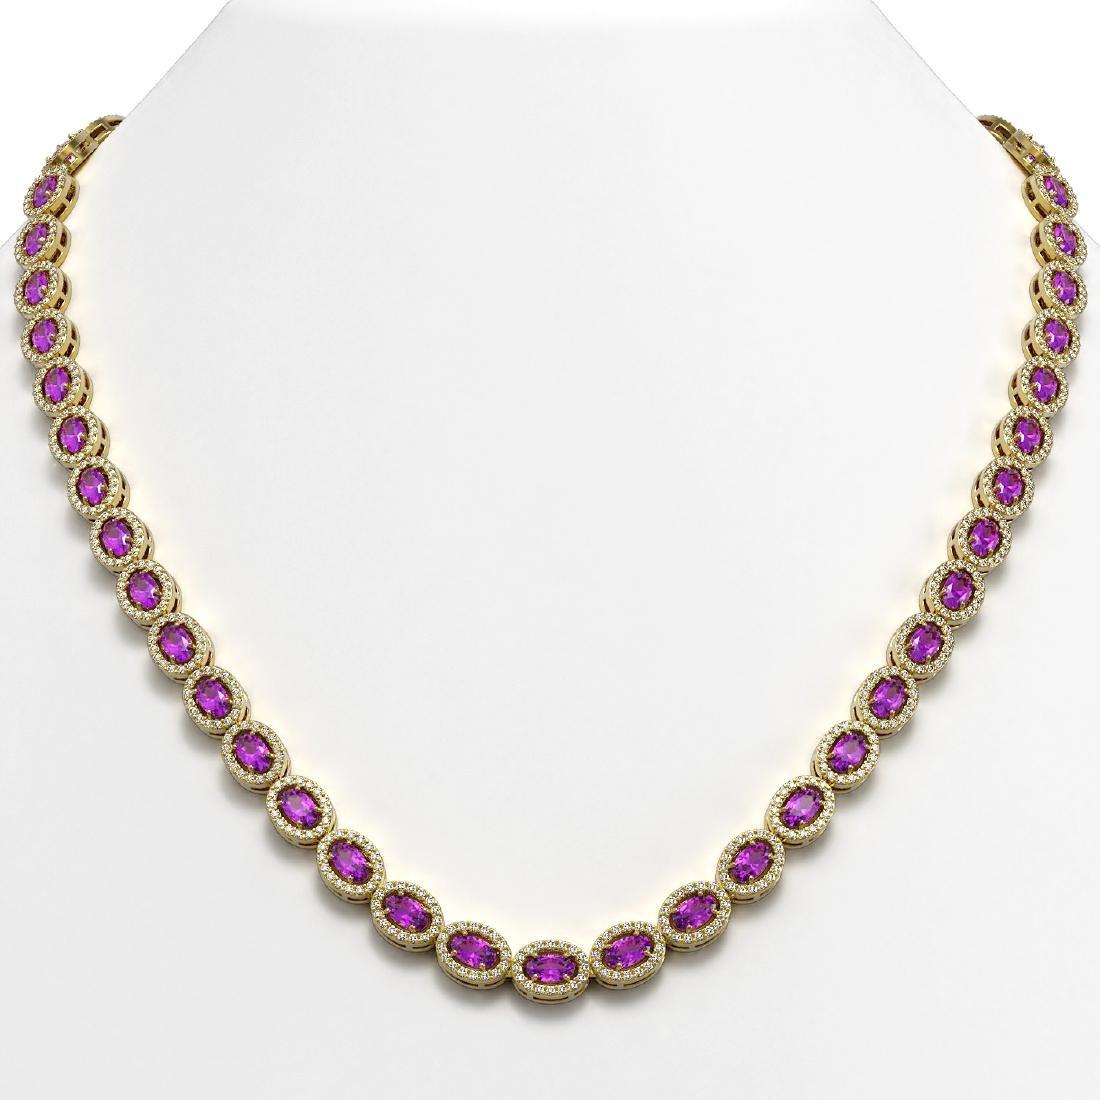 20.62 CTW Amethyst & Diamond Halo Necklace 10K Yellow